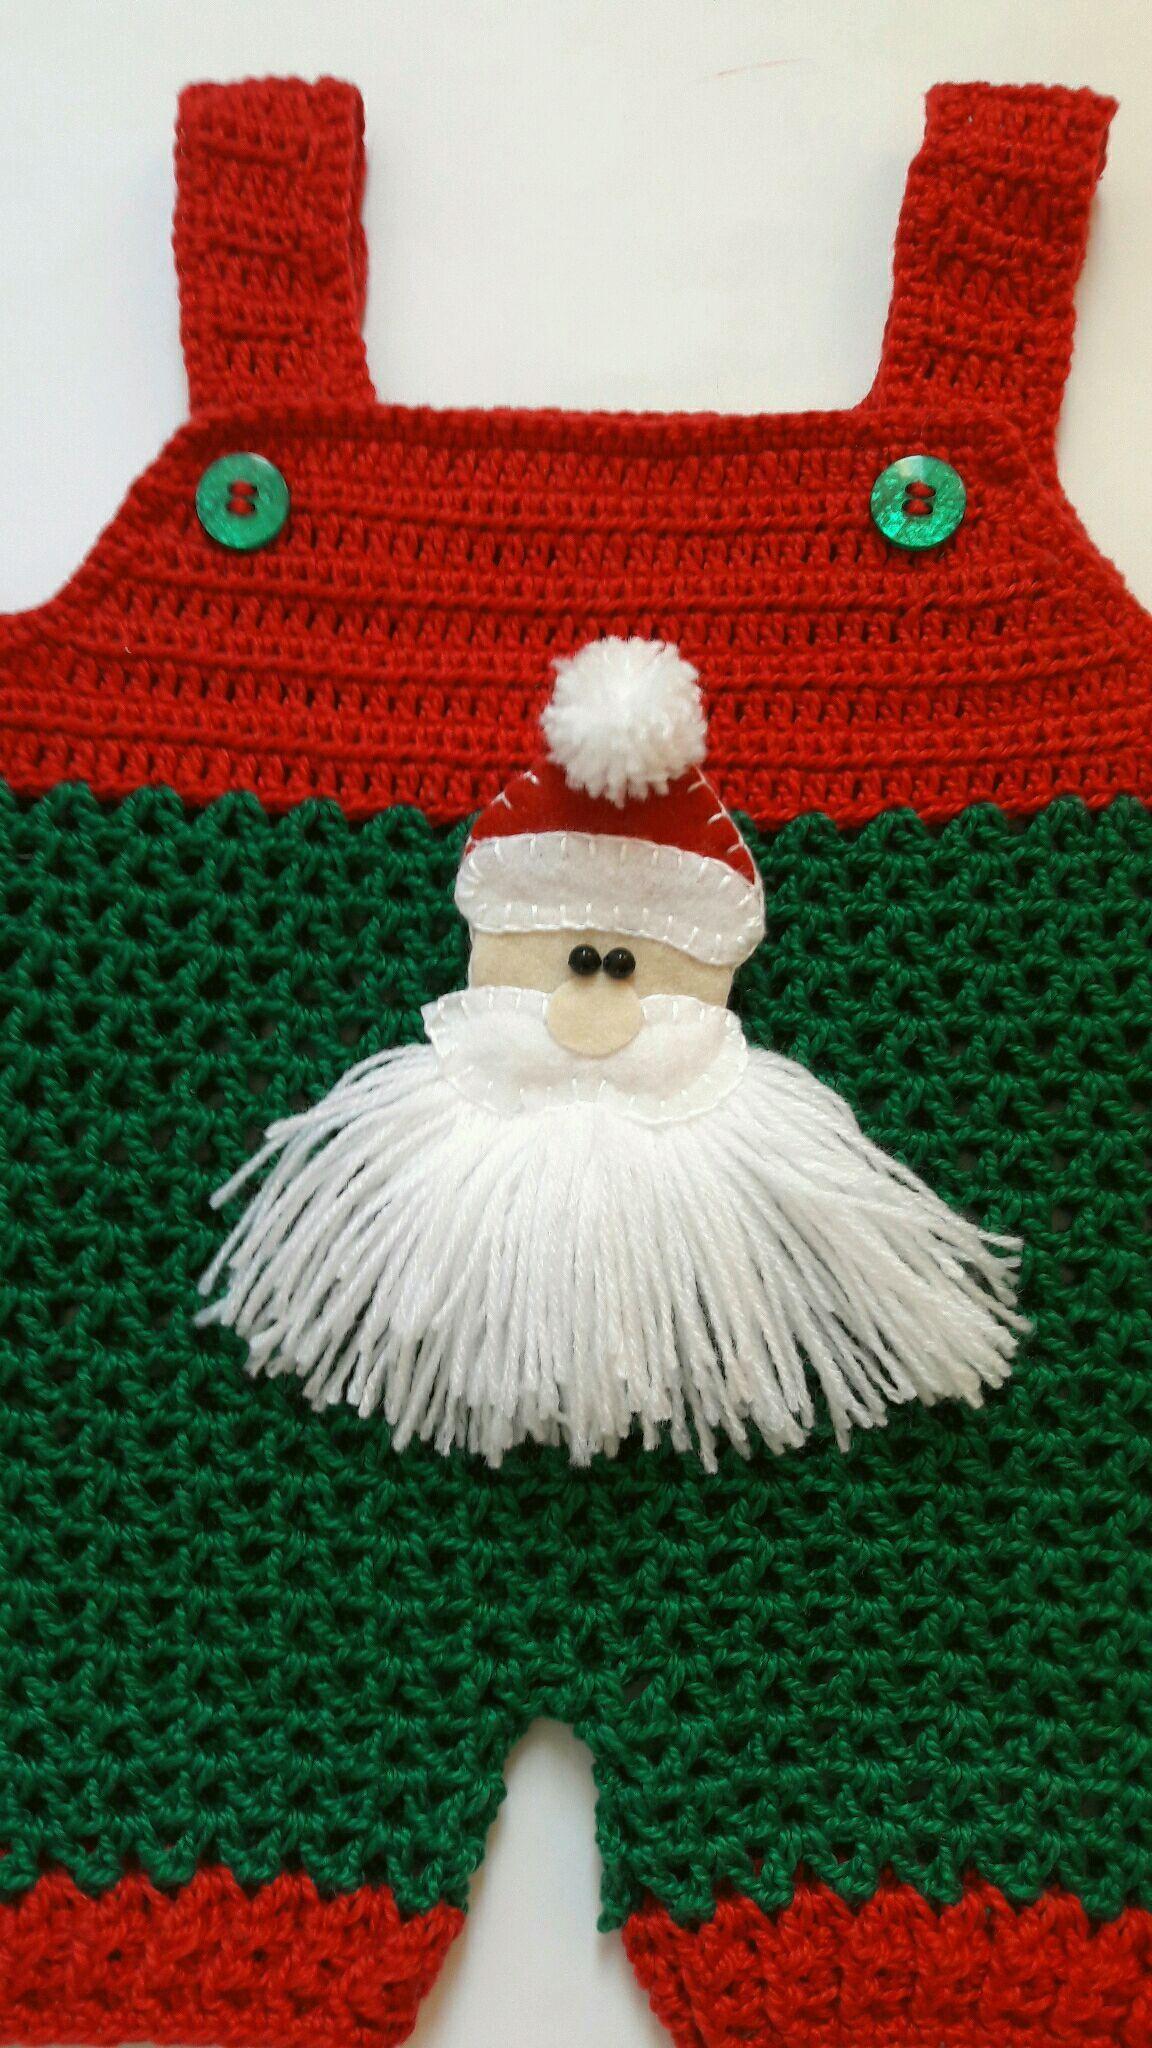 Jardineira Crochê Papai Noel no Elo7  0b38f173535